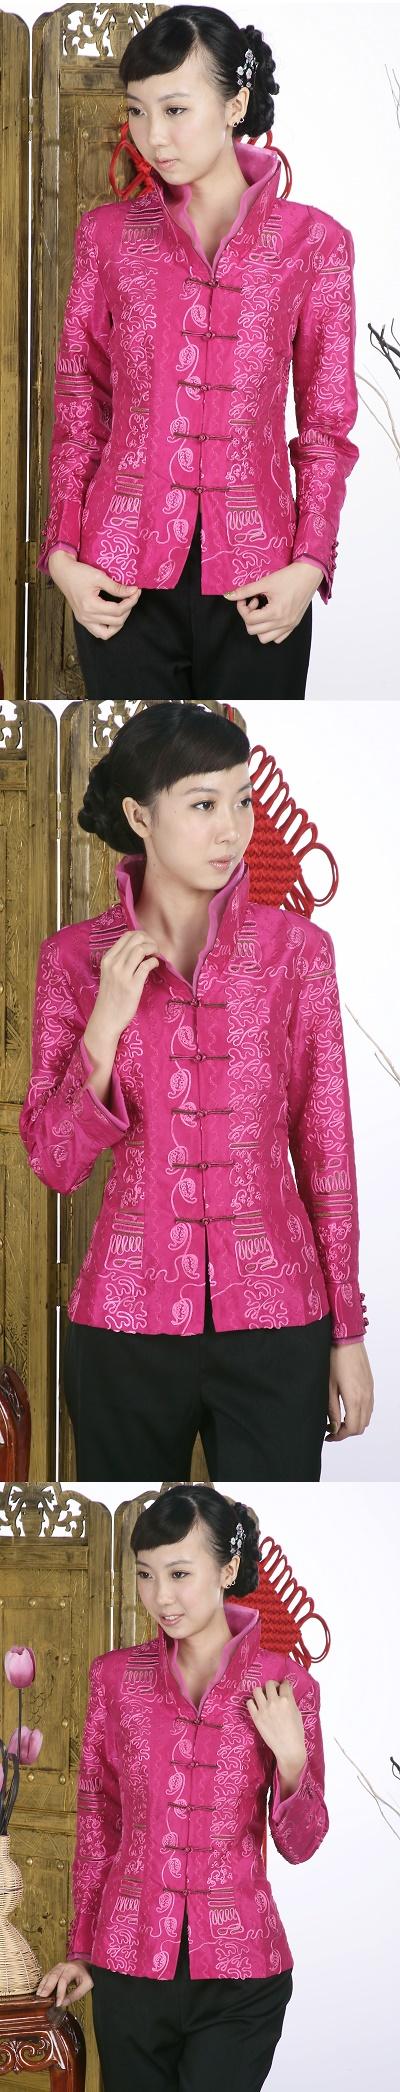 Embossed Embroidery Mandarin Jacket (Fuchsia)